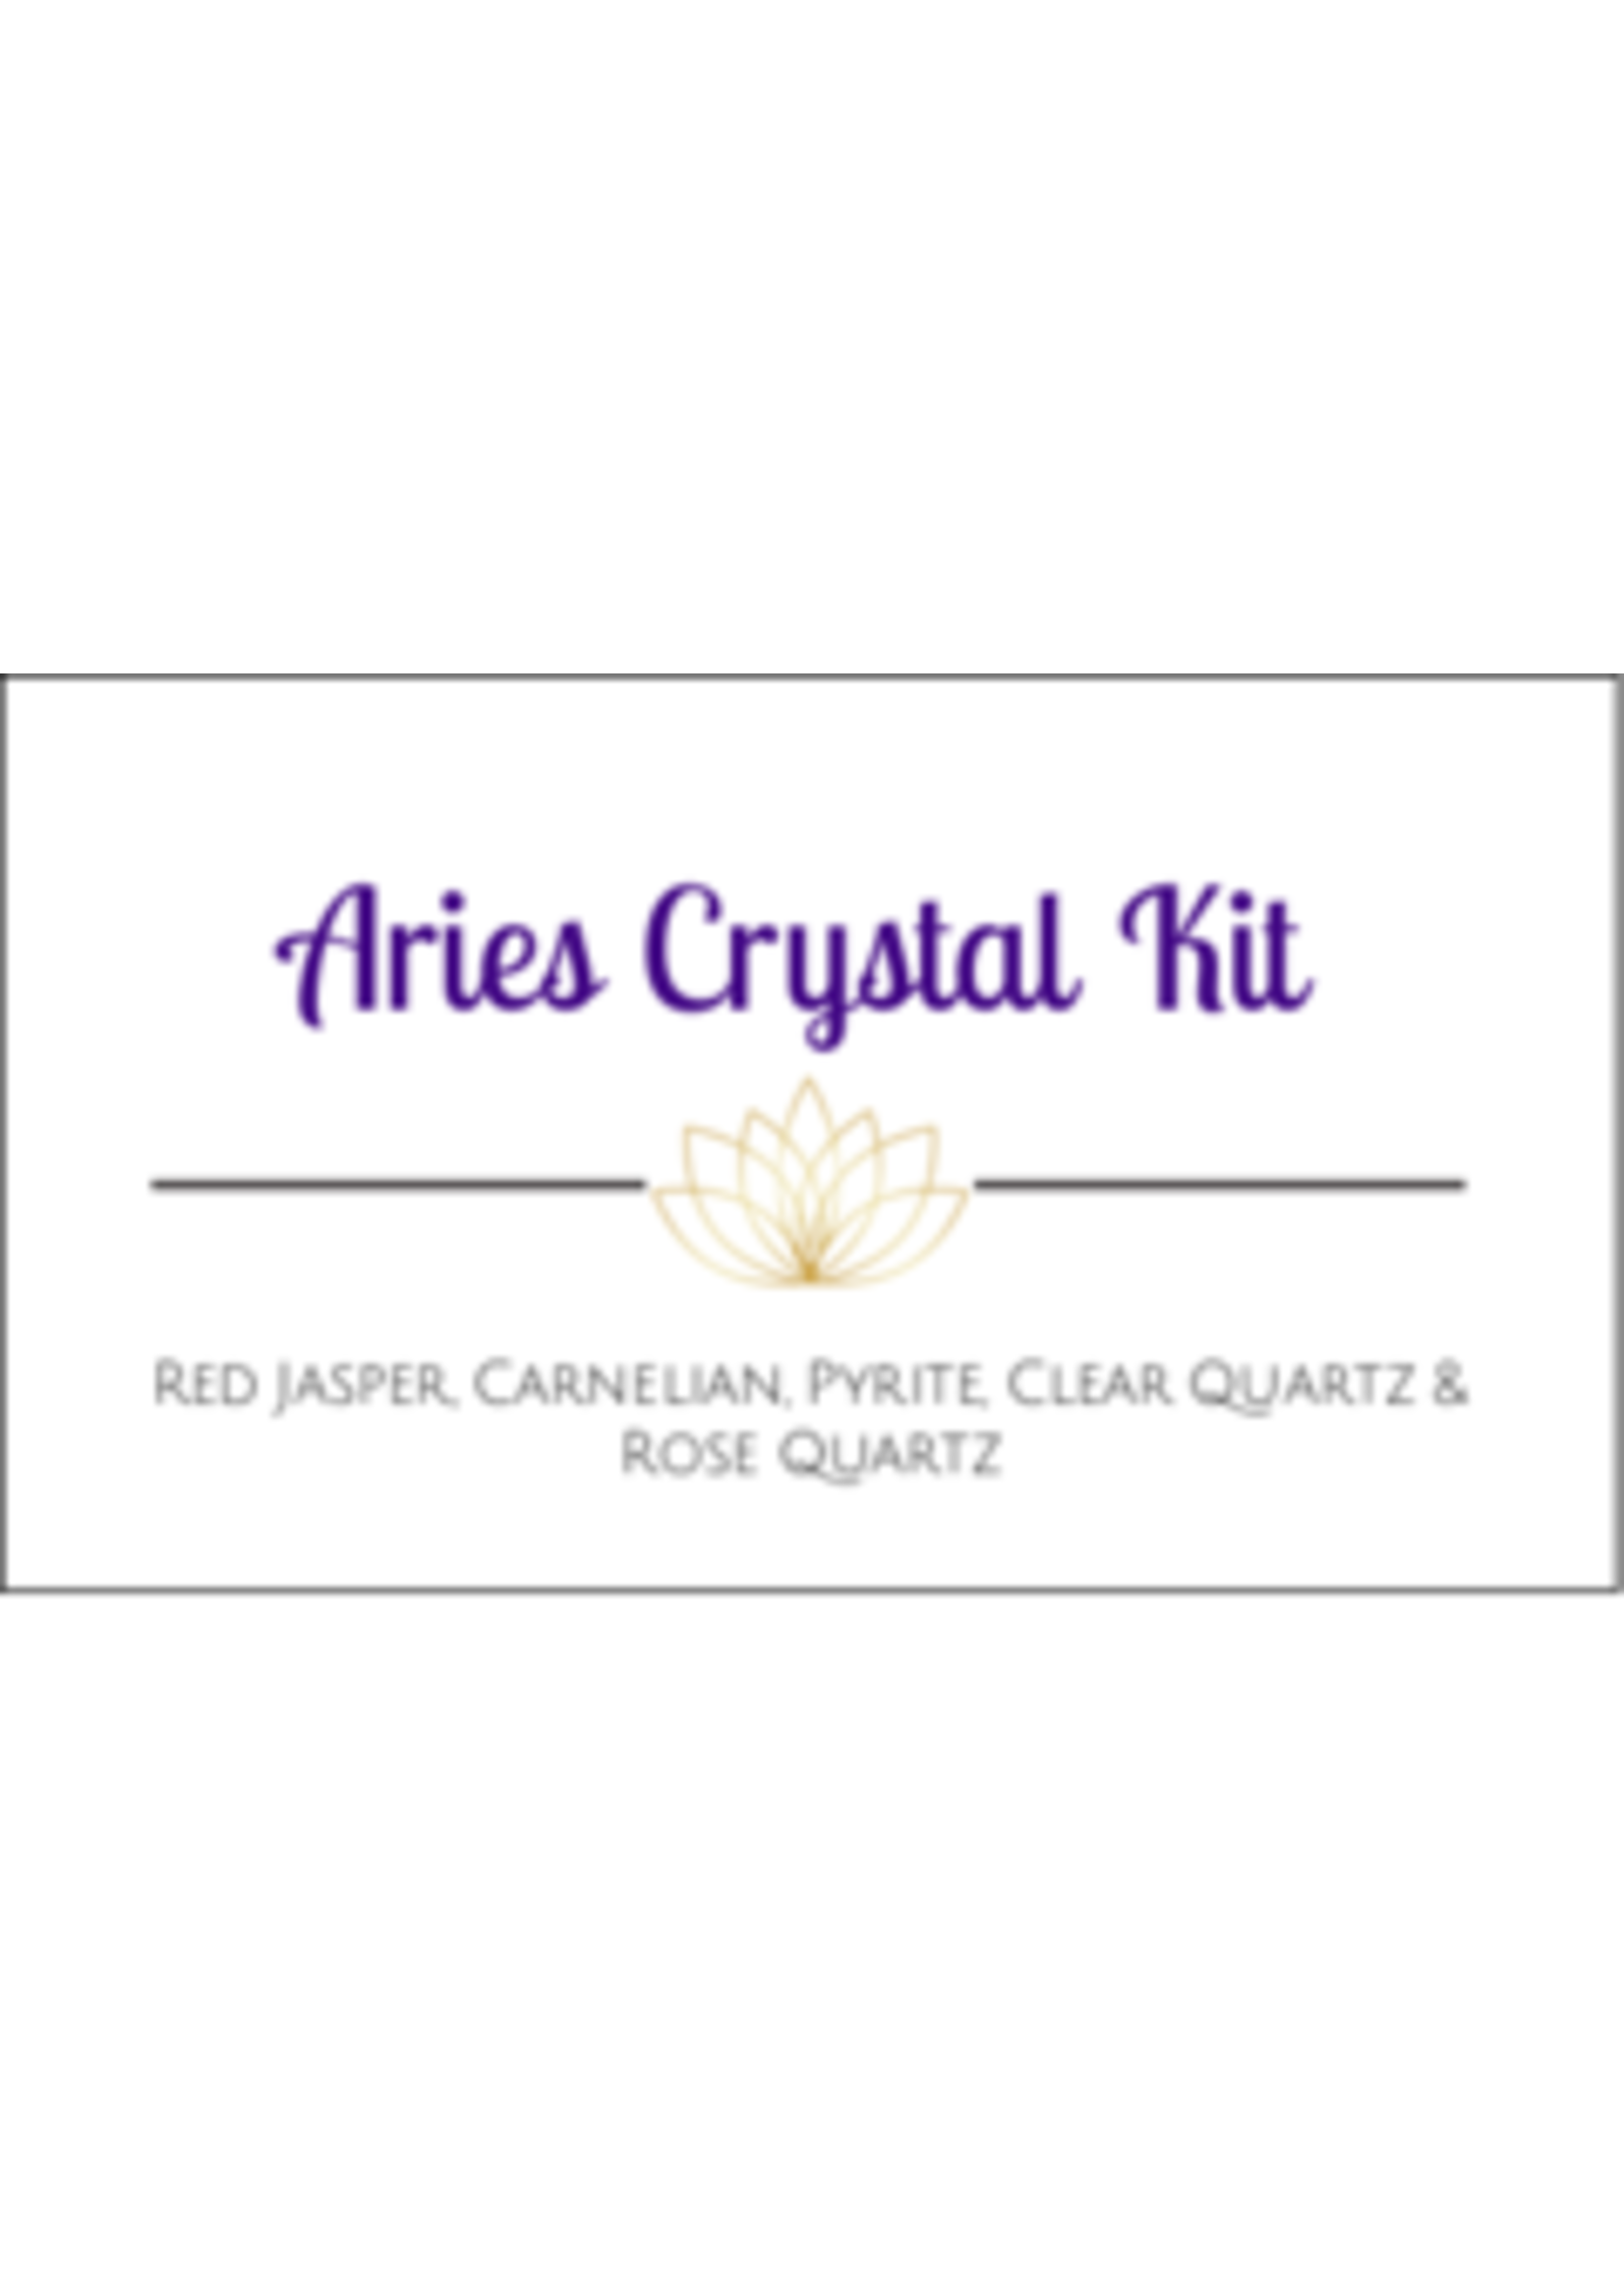 Aries Zodiac Crystal Kit Cards - Box of 100